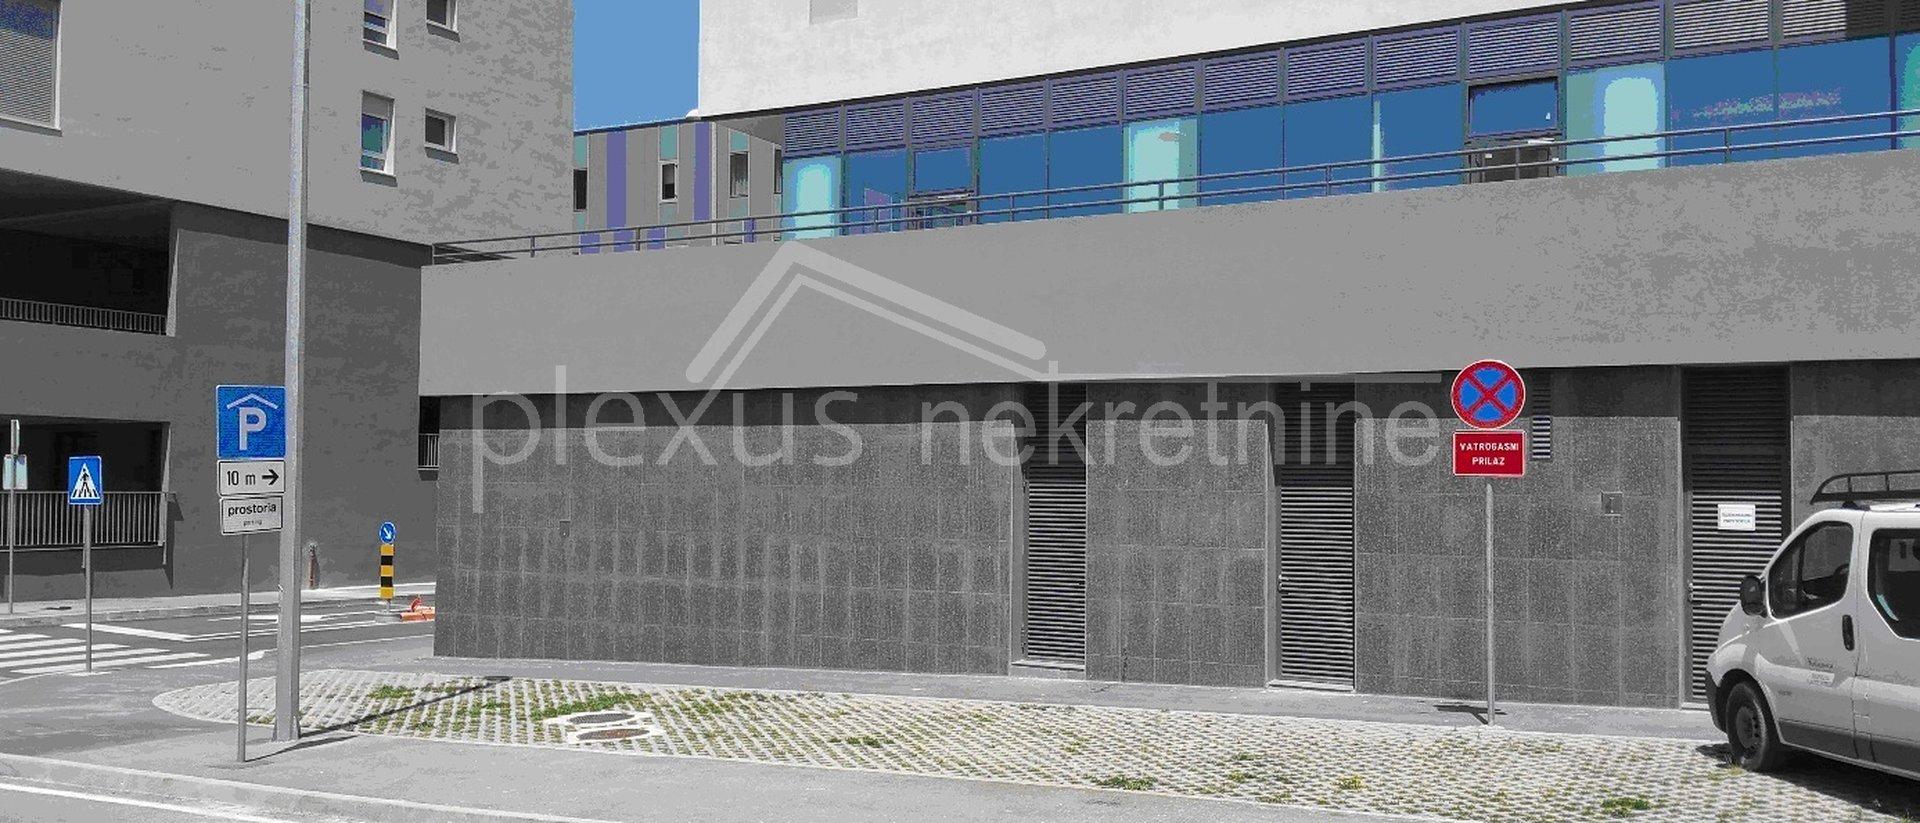 Uffici, 196 m2, Affitto, Split - Trstenik